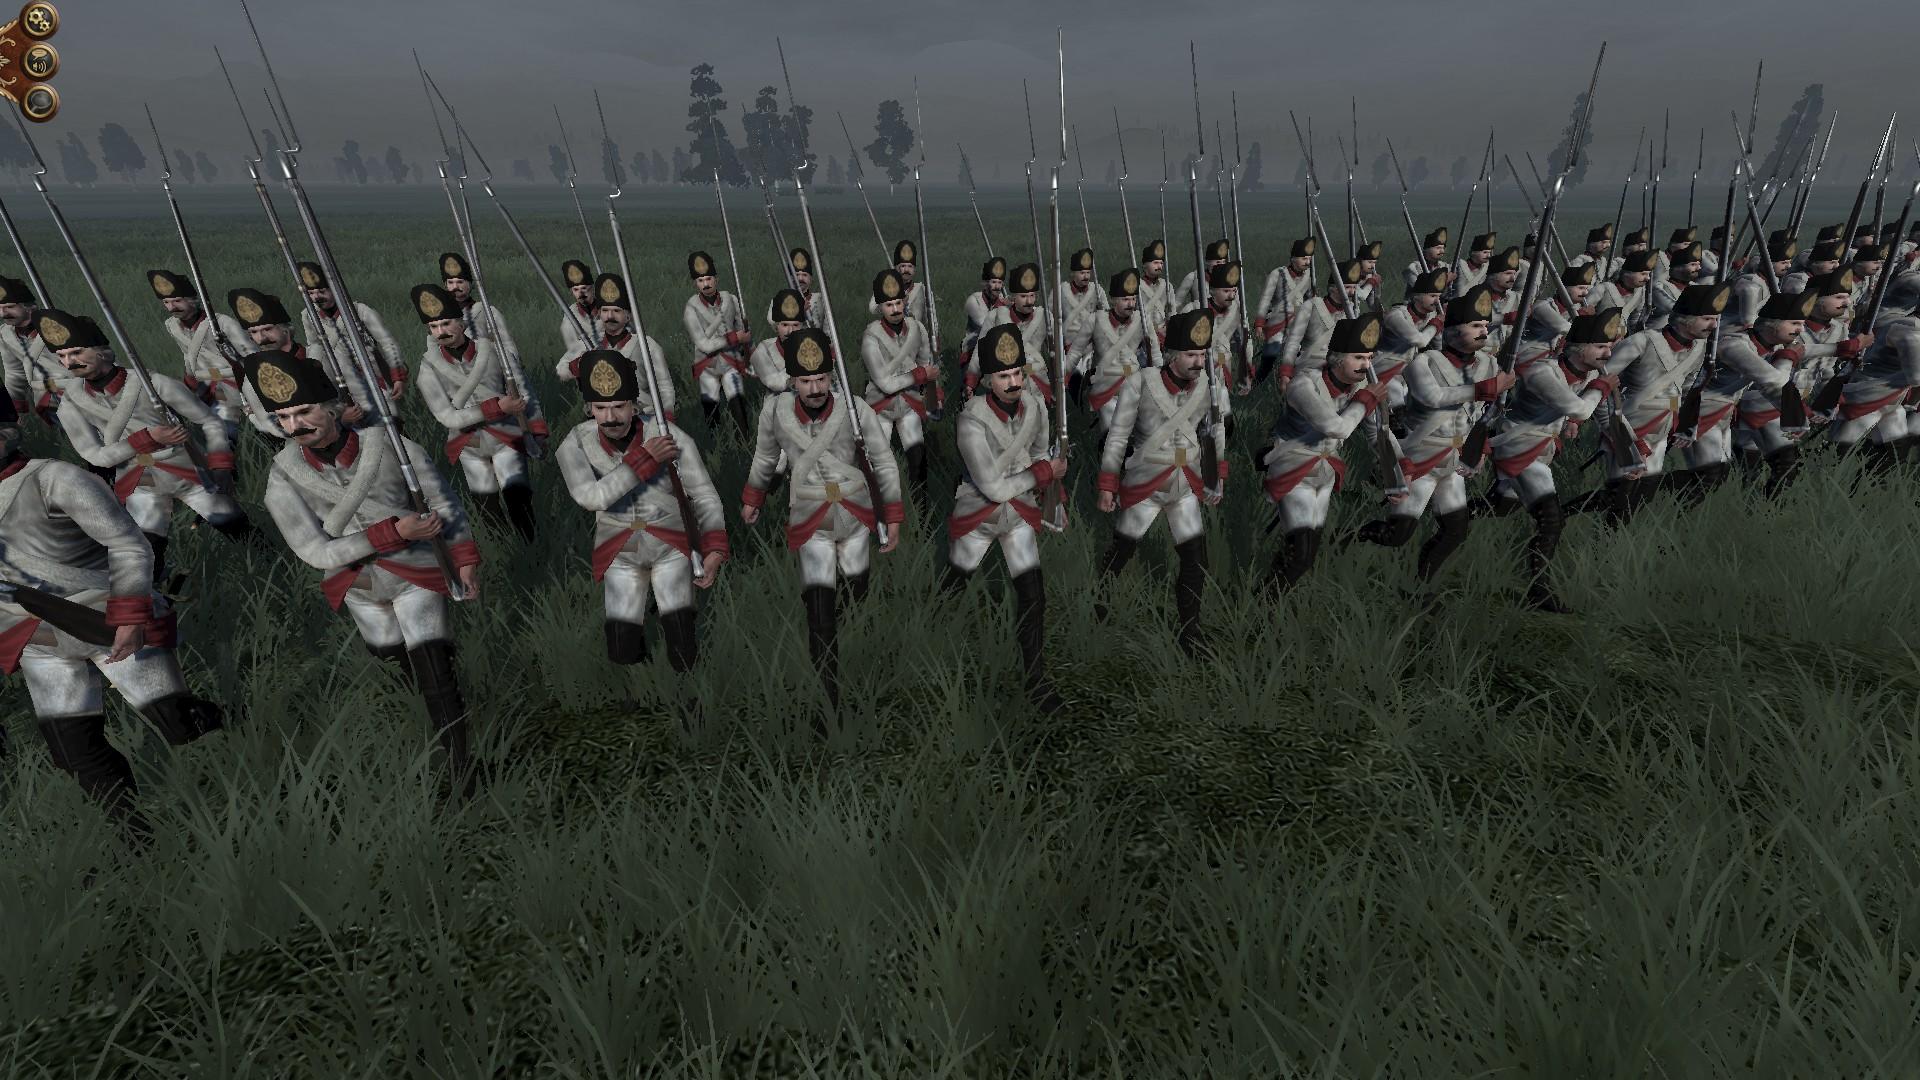 Austria Regiment Kaiser